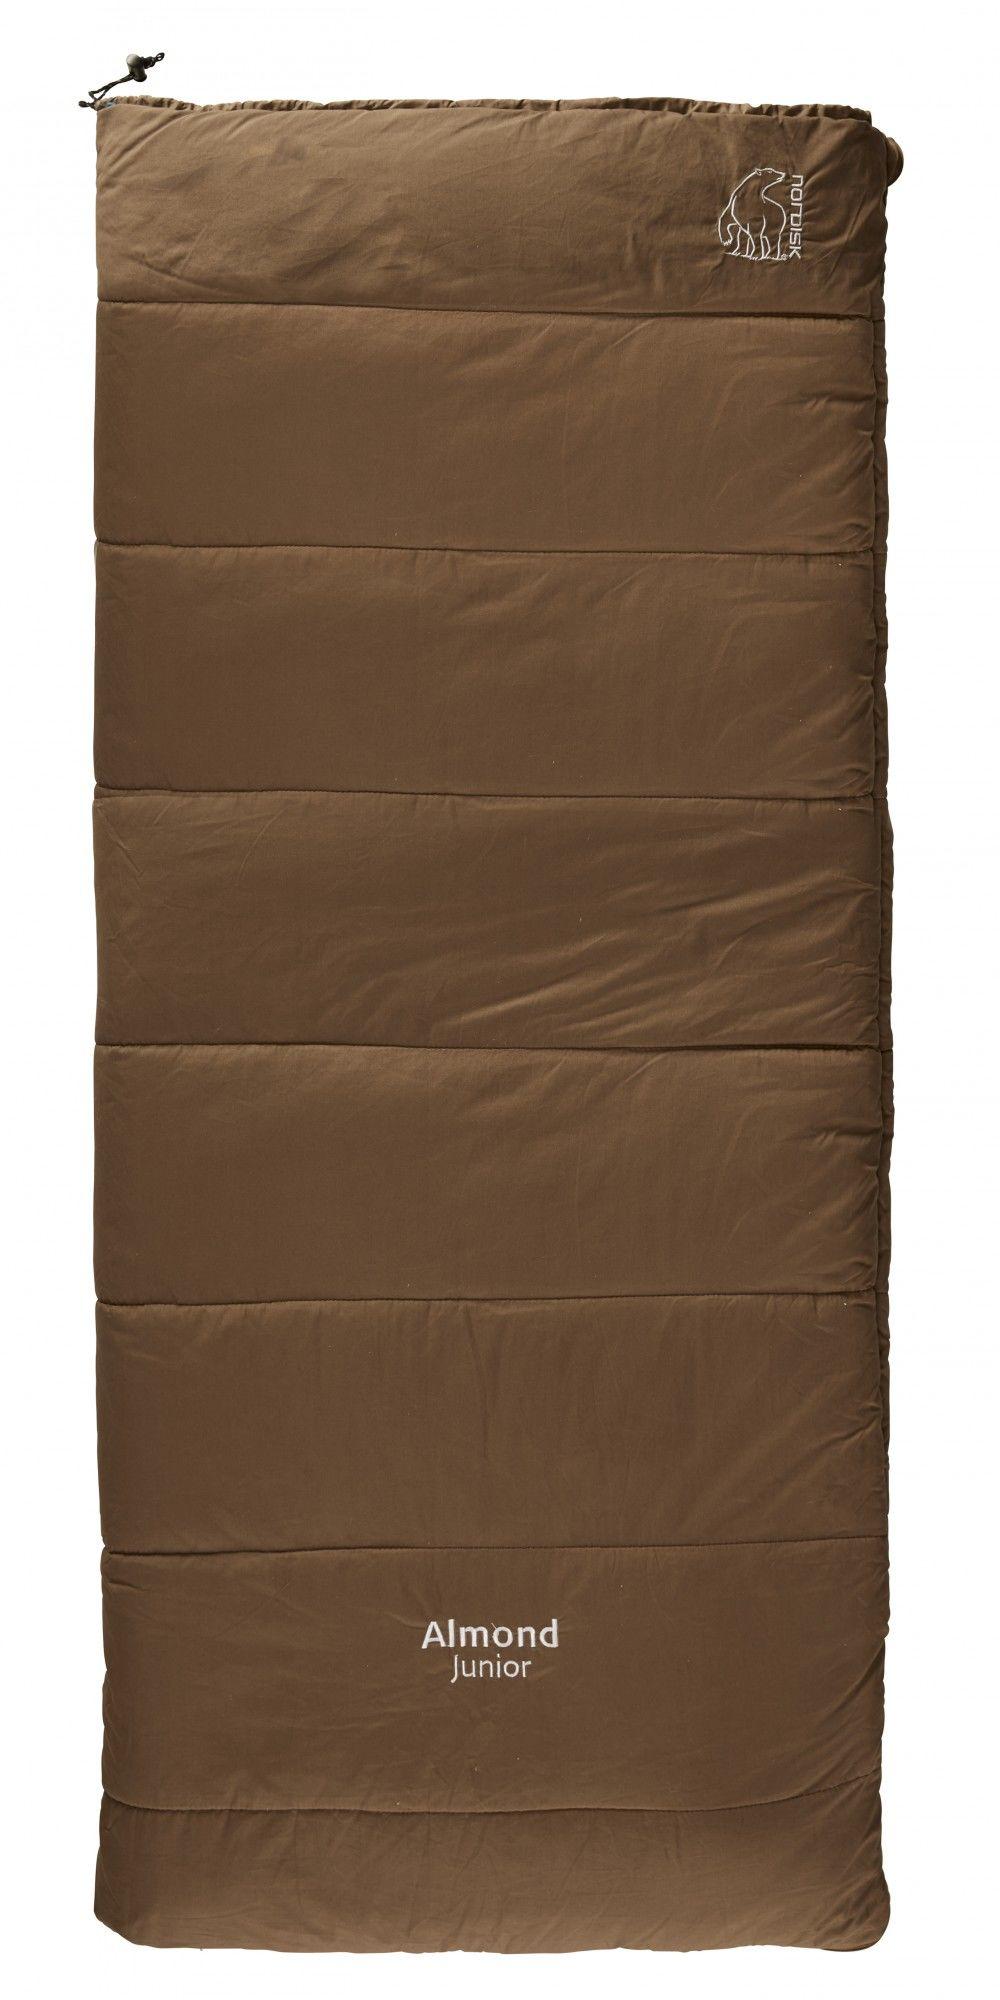 Nordisk Almond -2° Junior   Größe 150 cm   Kinder Kunstfaserschlafsack